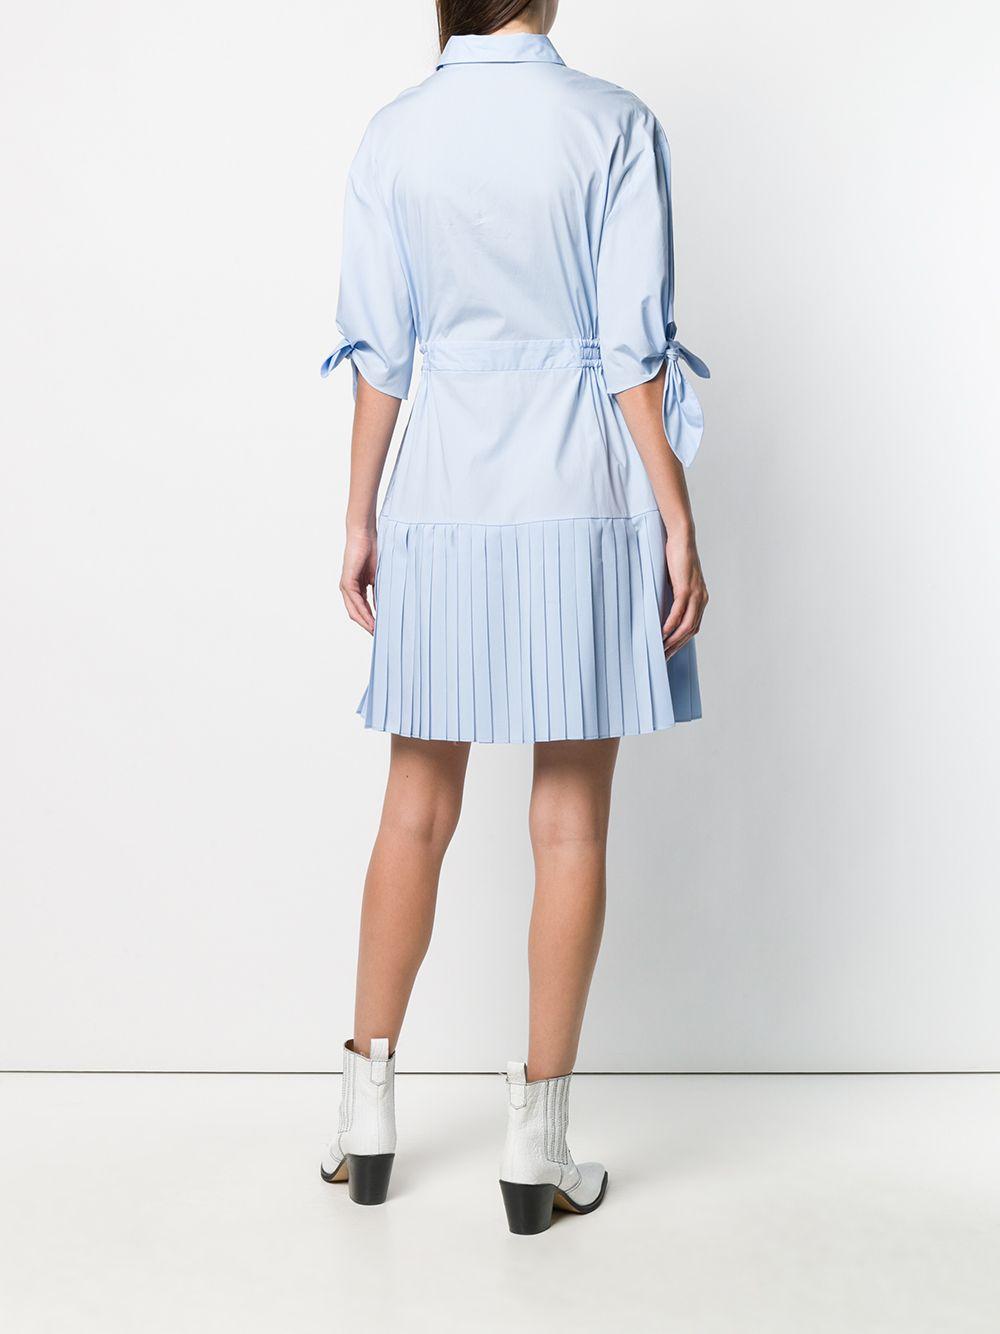 PINKO | платье-рубашка с плиссировкой | Clouty